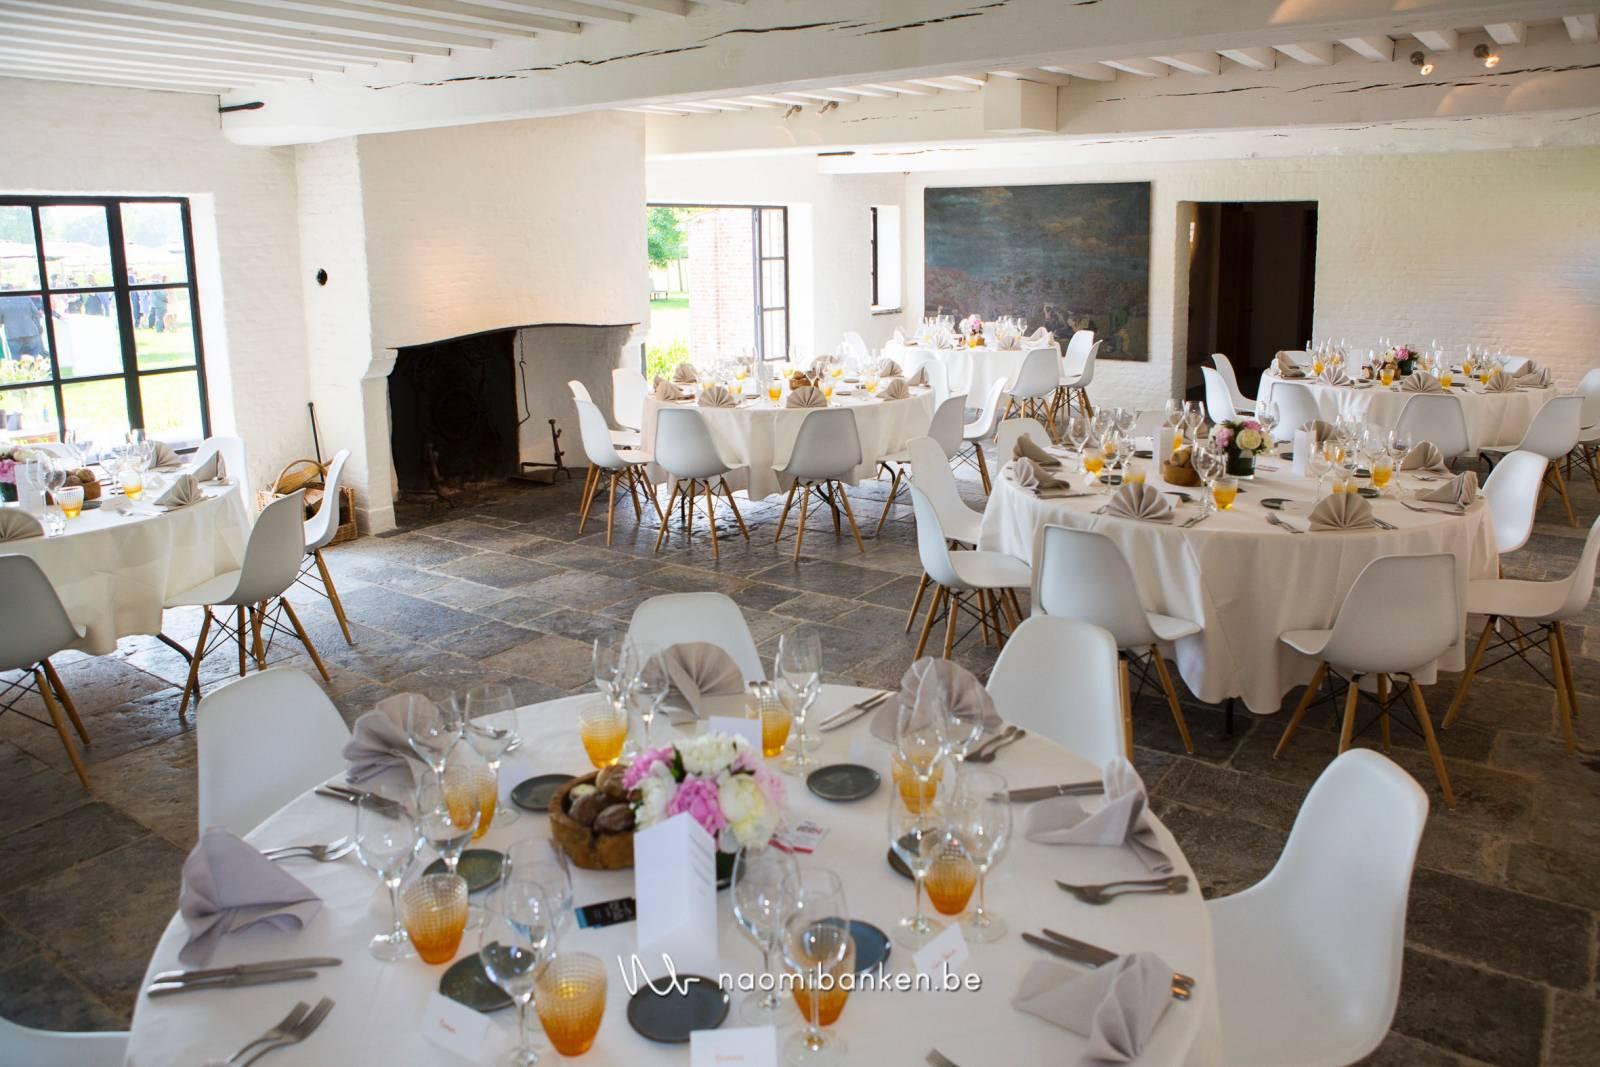 Tertia Catering17_Naomi Banken - House of Weddings